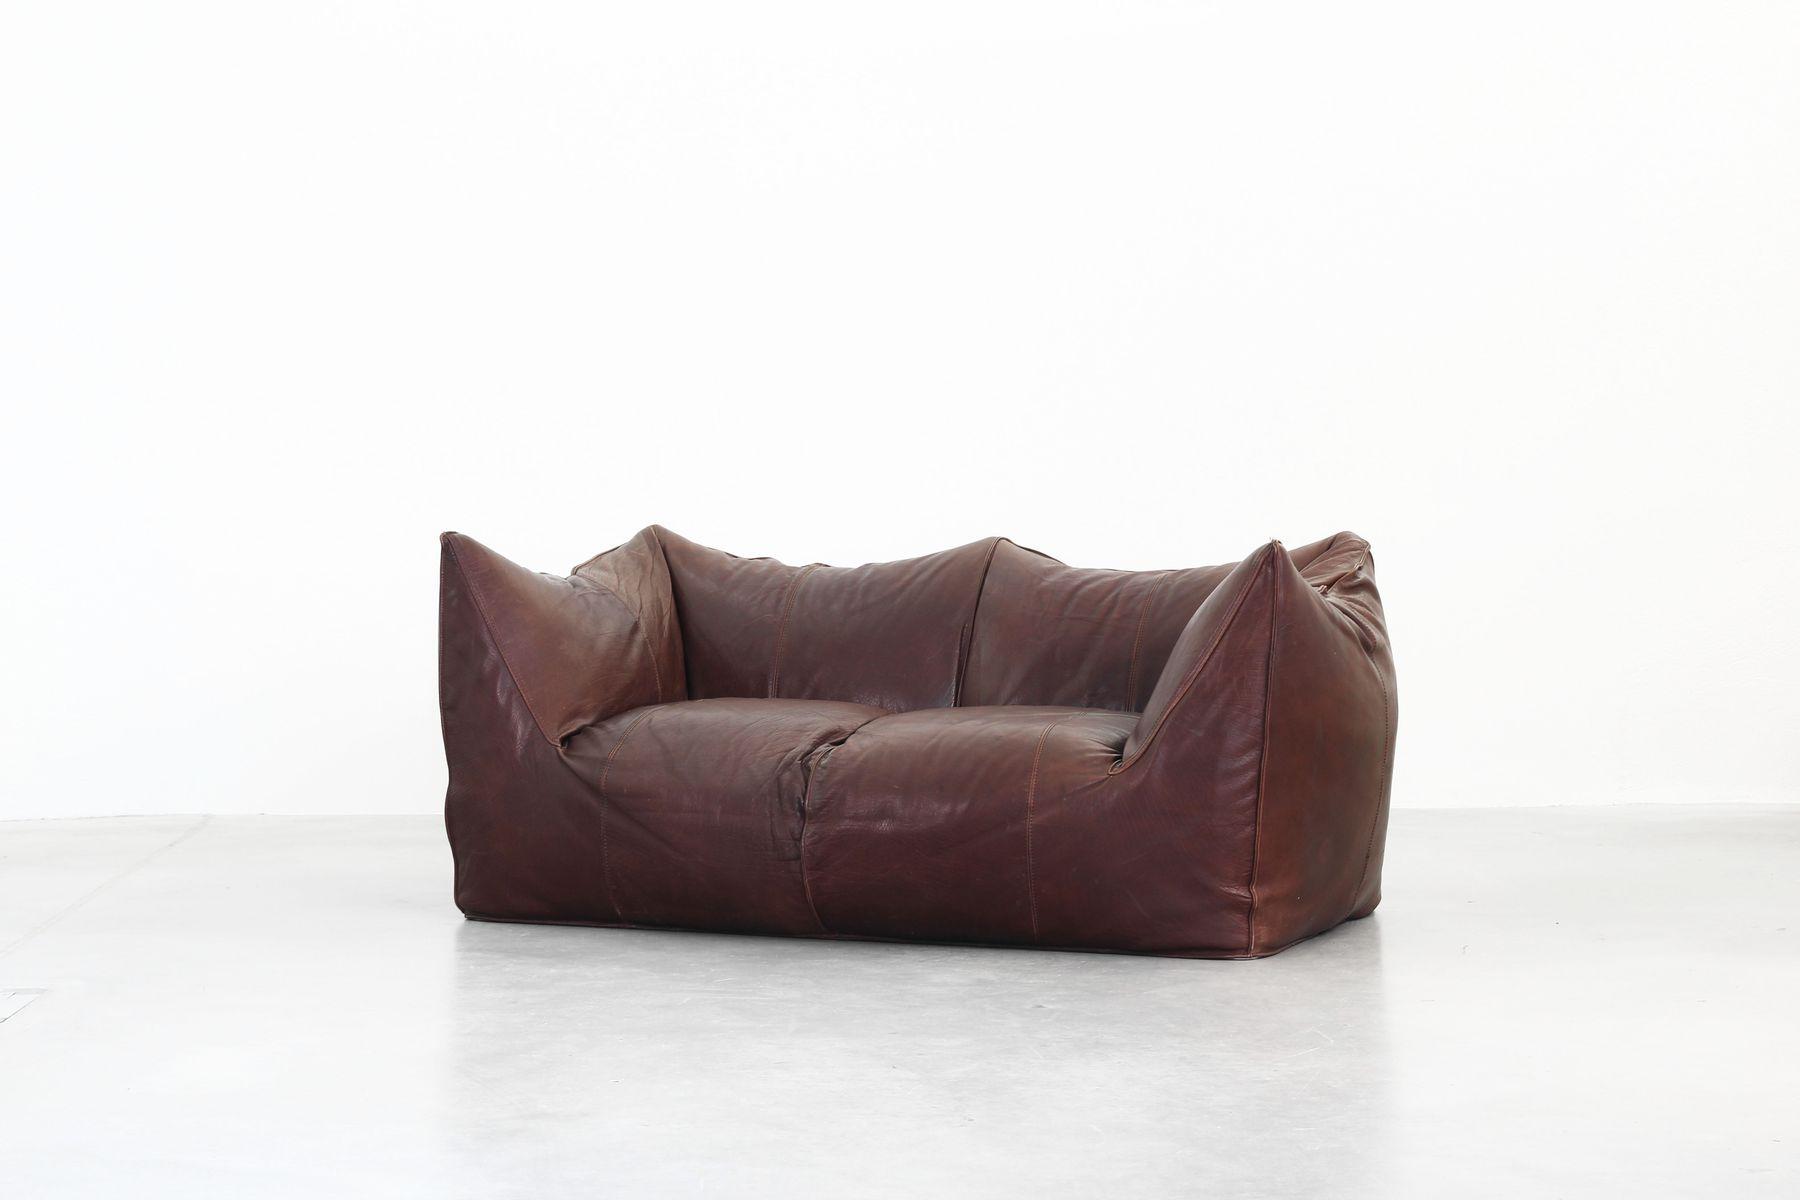 Le Bambole Sofa By Mario Bellini For B B Italia 1973 For Sale At Pamono